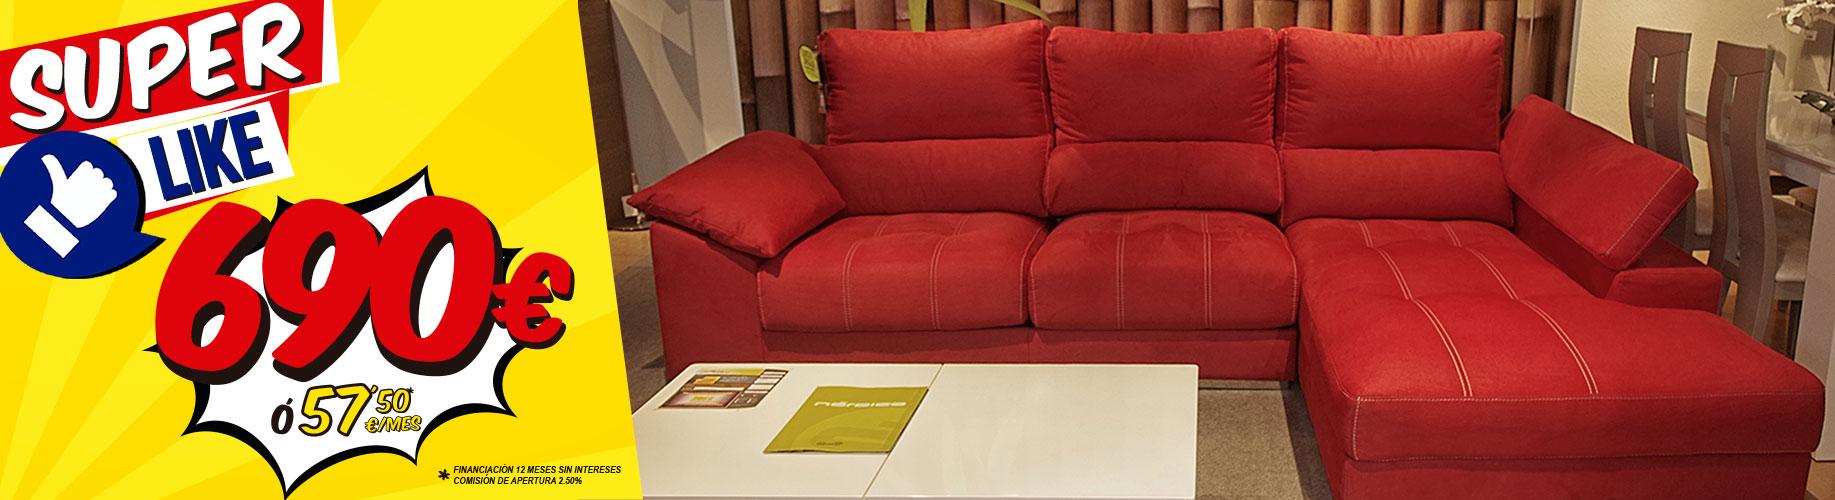 Muebles Santa Cruz Santa Olalla Categoras Con Produccin Y Equipo  # Muebles Vazquez Santa Olalla